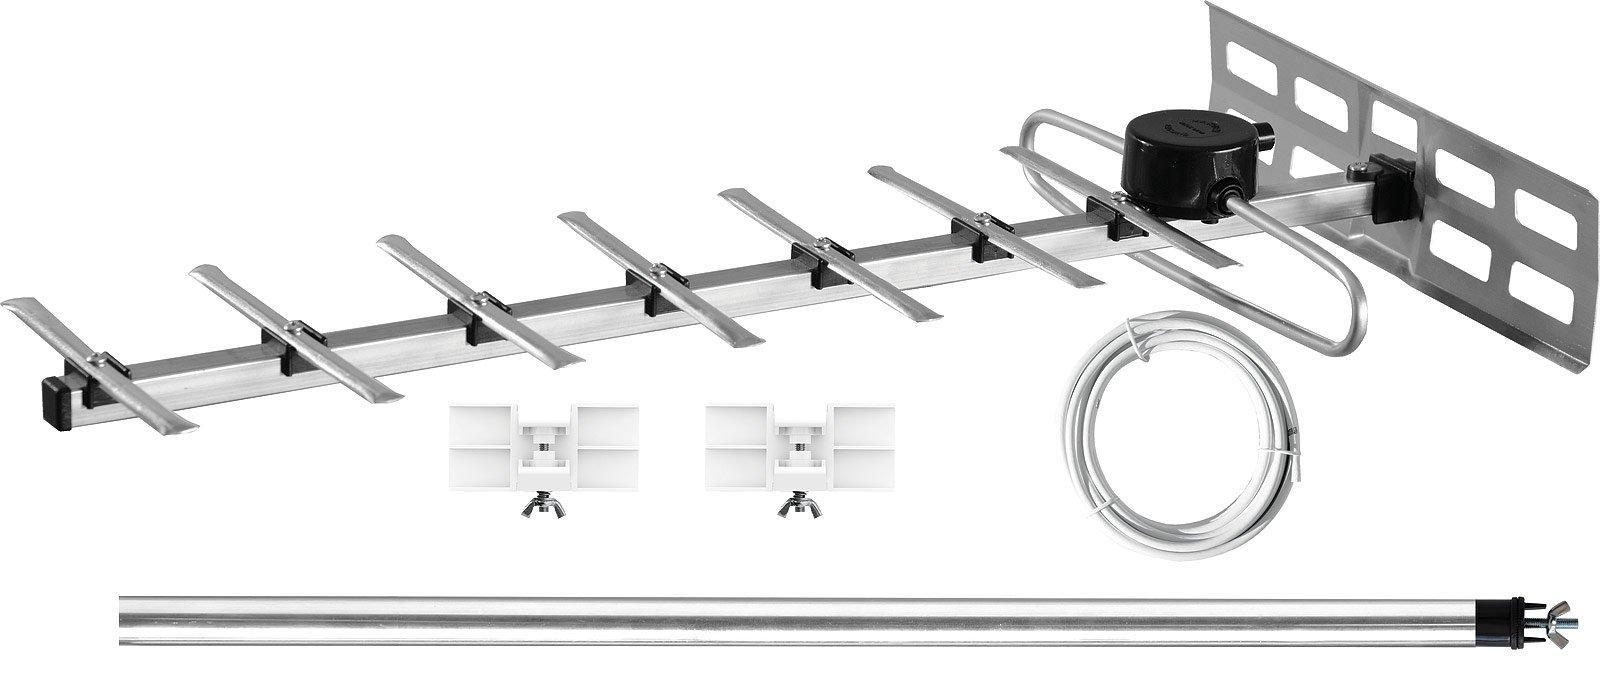 CLEARANCE 8-Element UHF TV Aerial Kit, NOCOLOUR/K